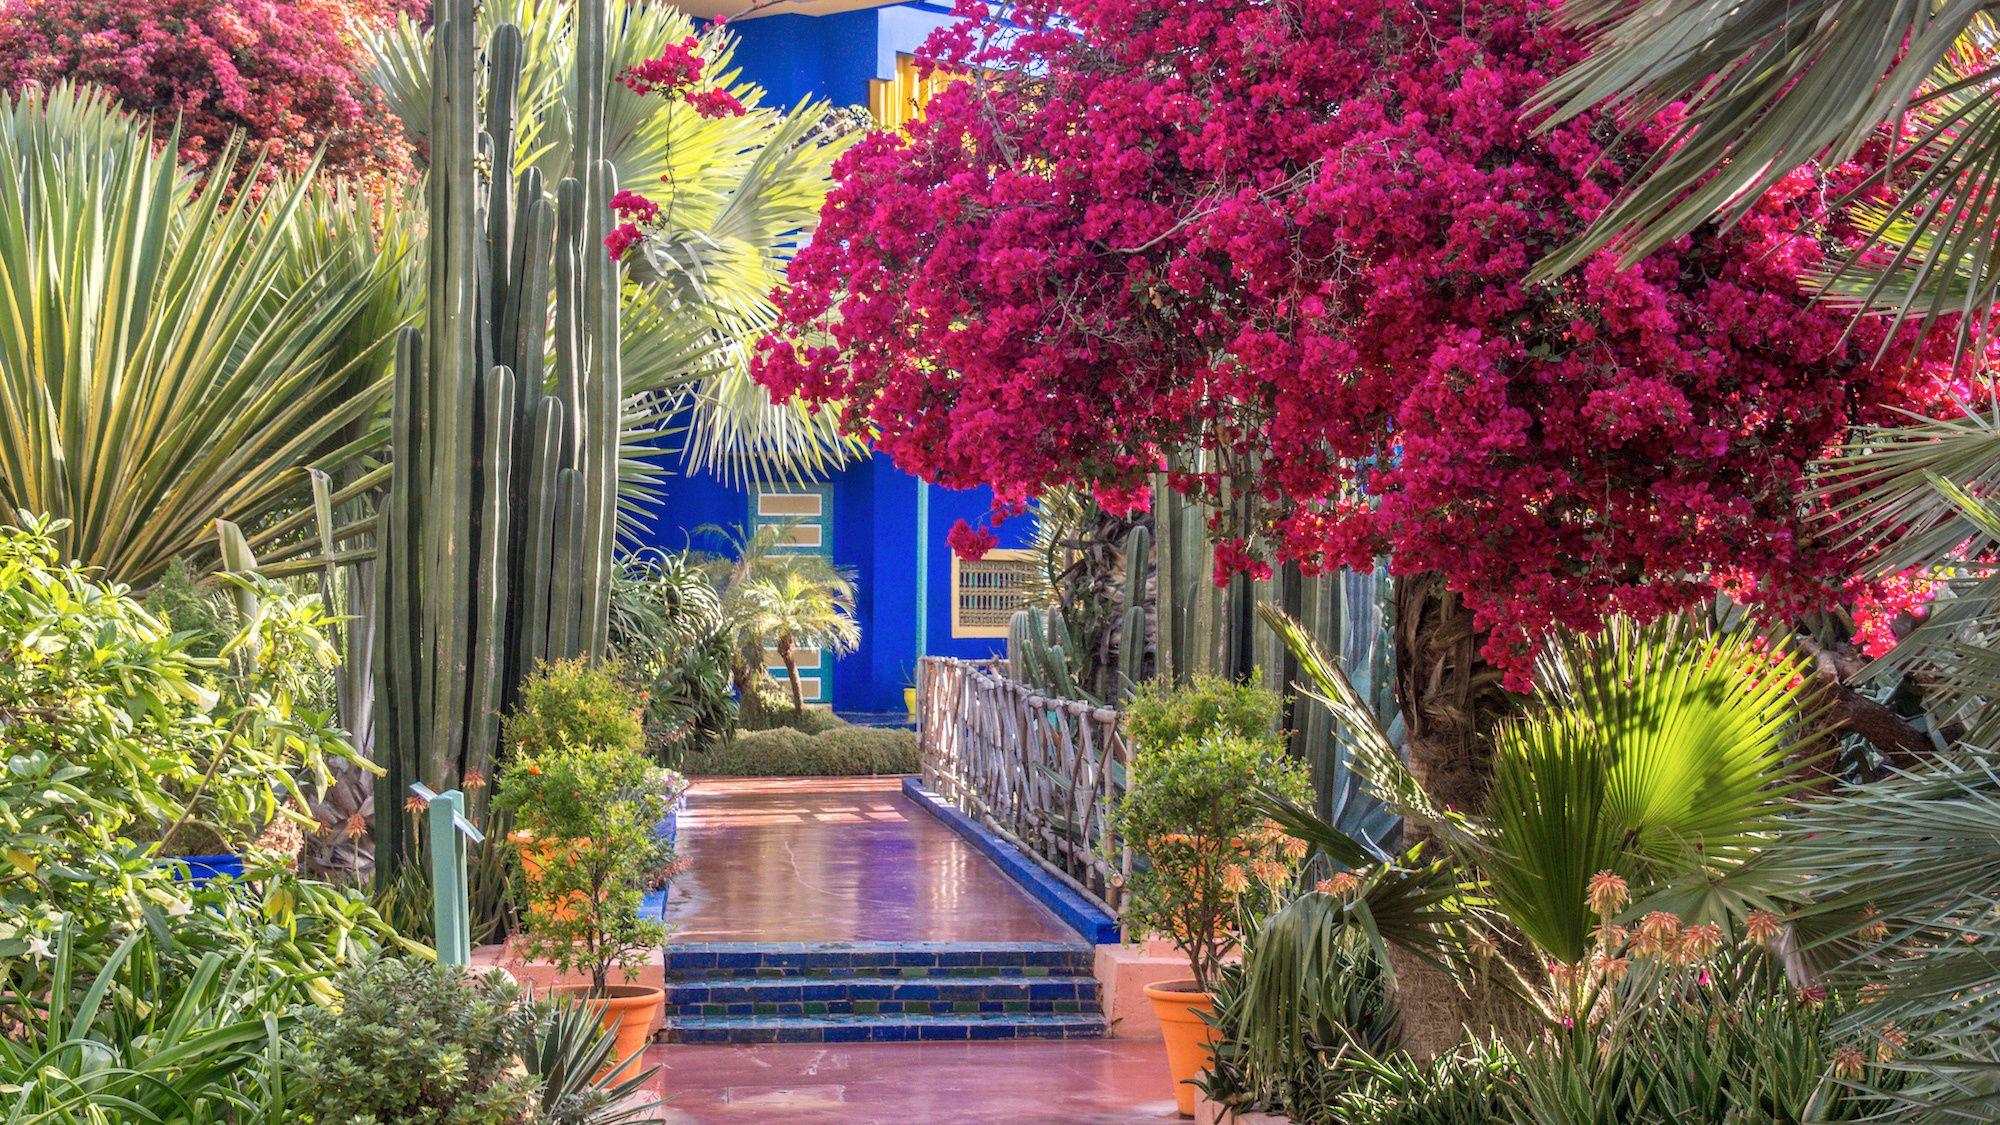 Botanical Gardens & City Ramparts Tour